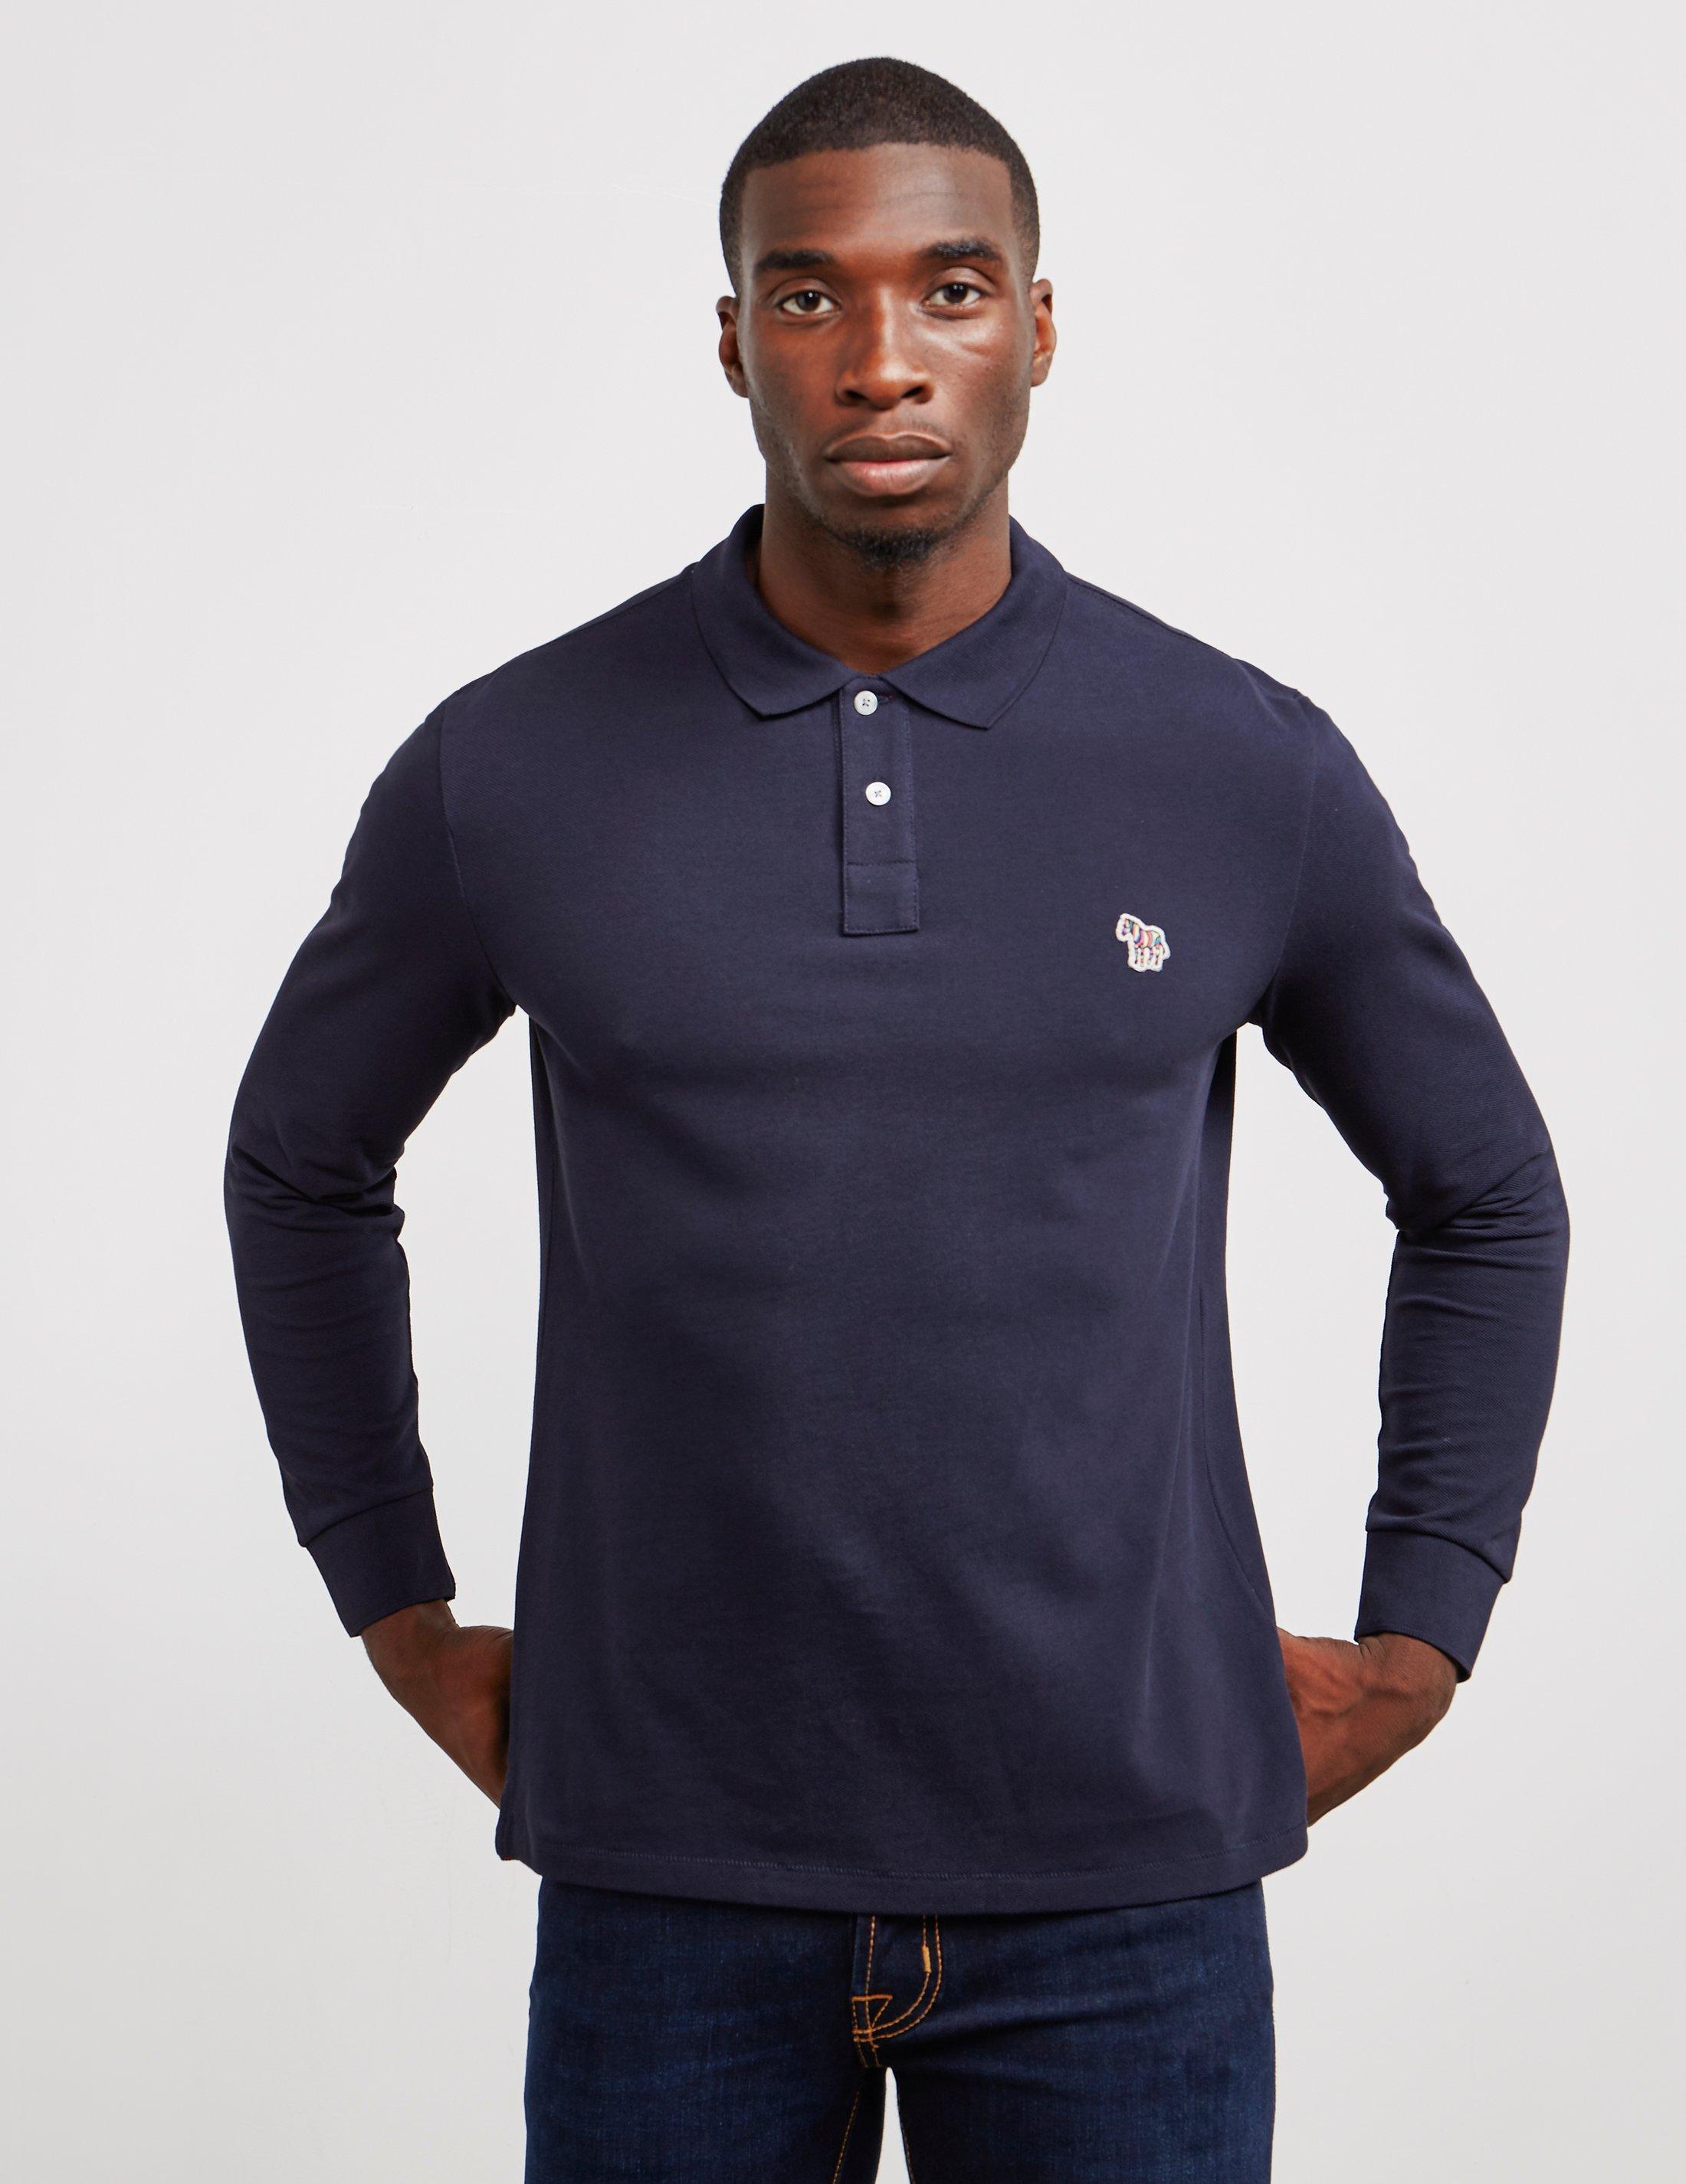 2021907f1 Lyst - PS by Paul Smith Basic Zebra Long Sleeve Polo Shirt Navy Blue ...